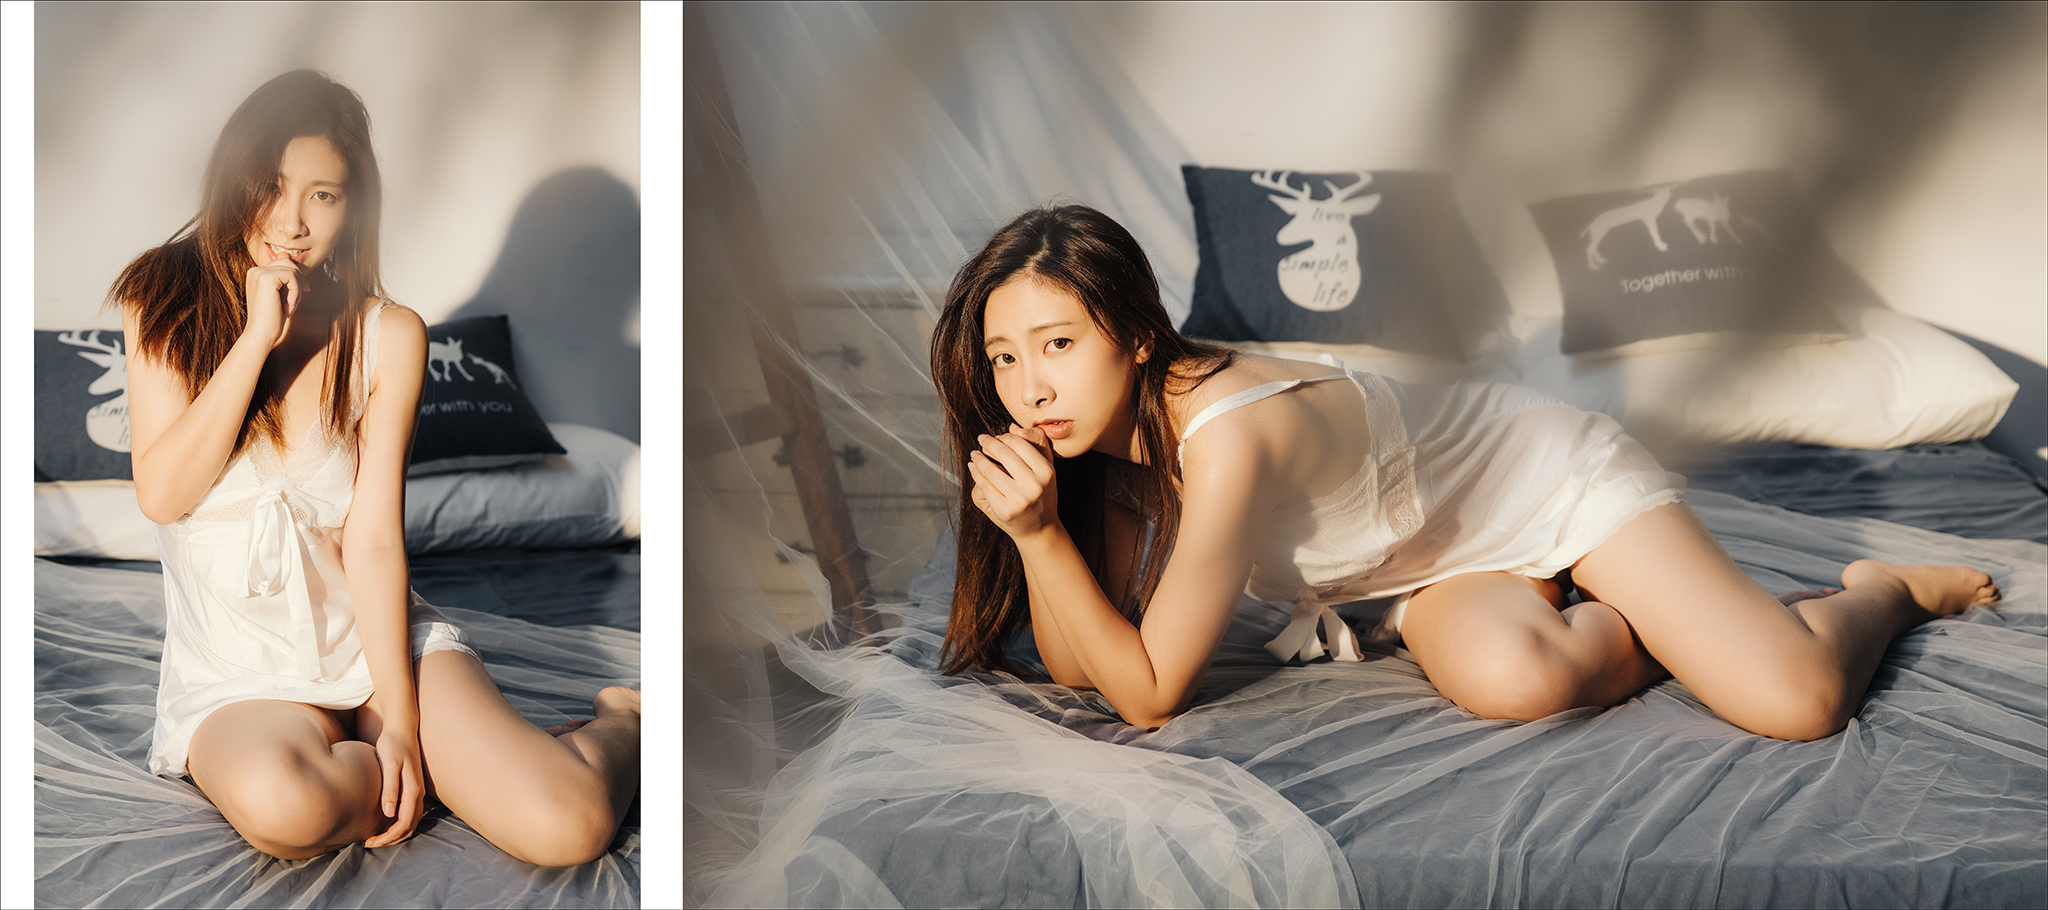 51375481374 be720cd759 o - 【寫真】+Angel+